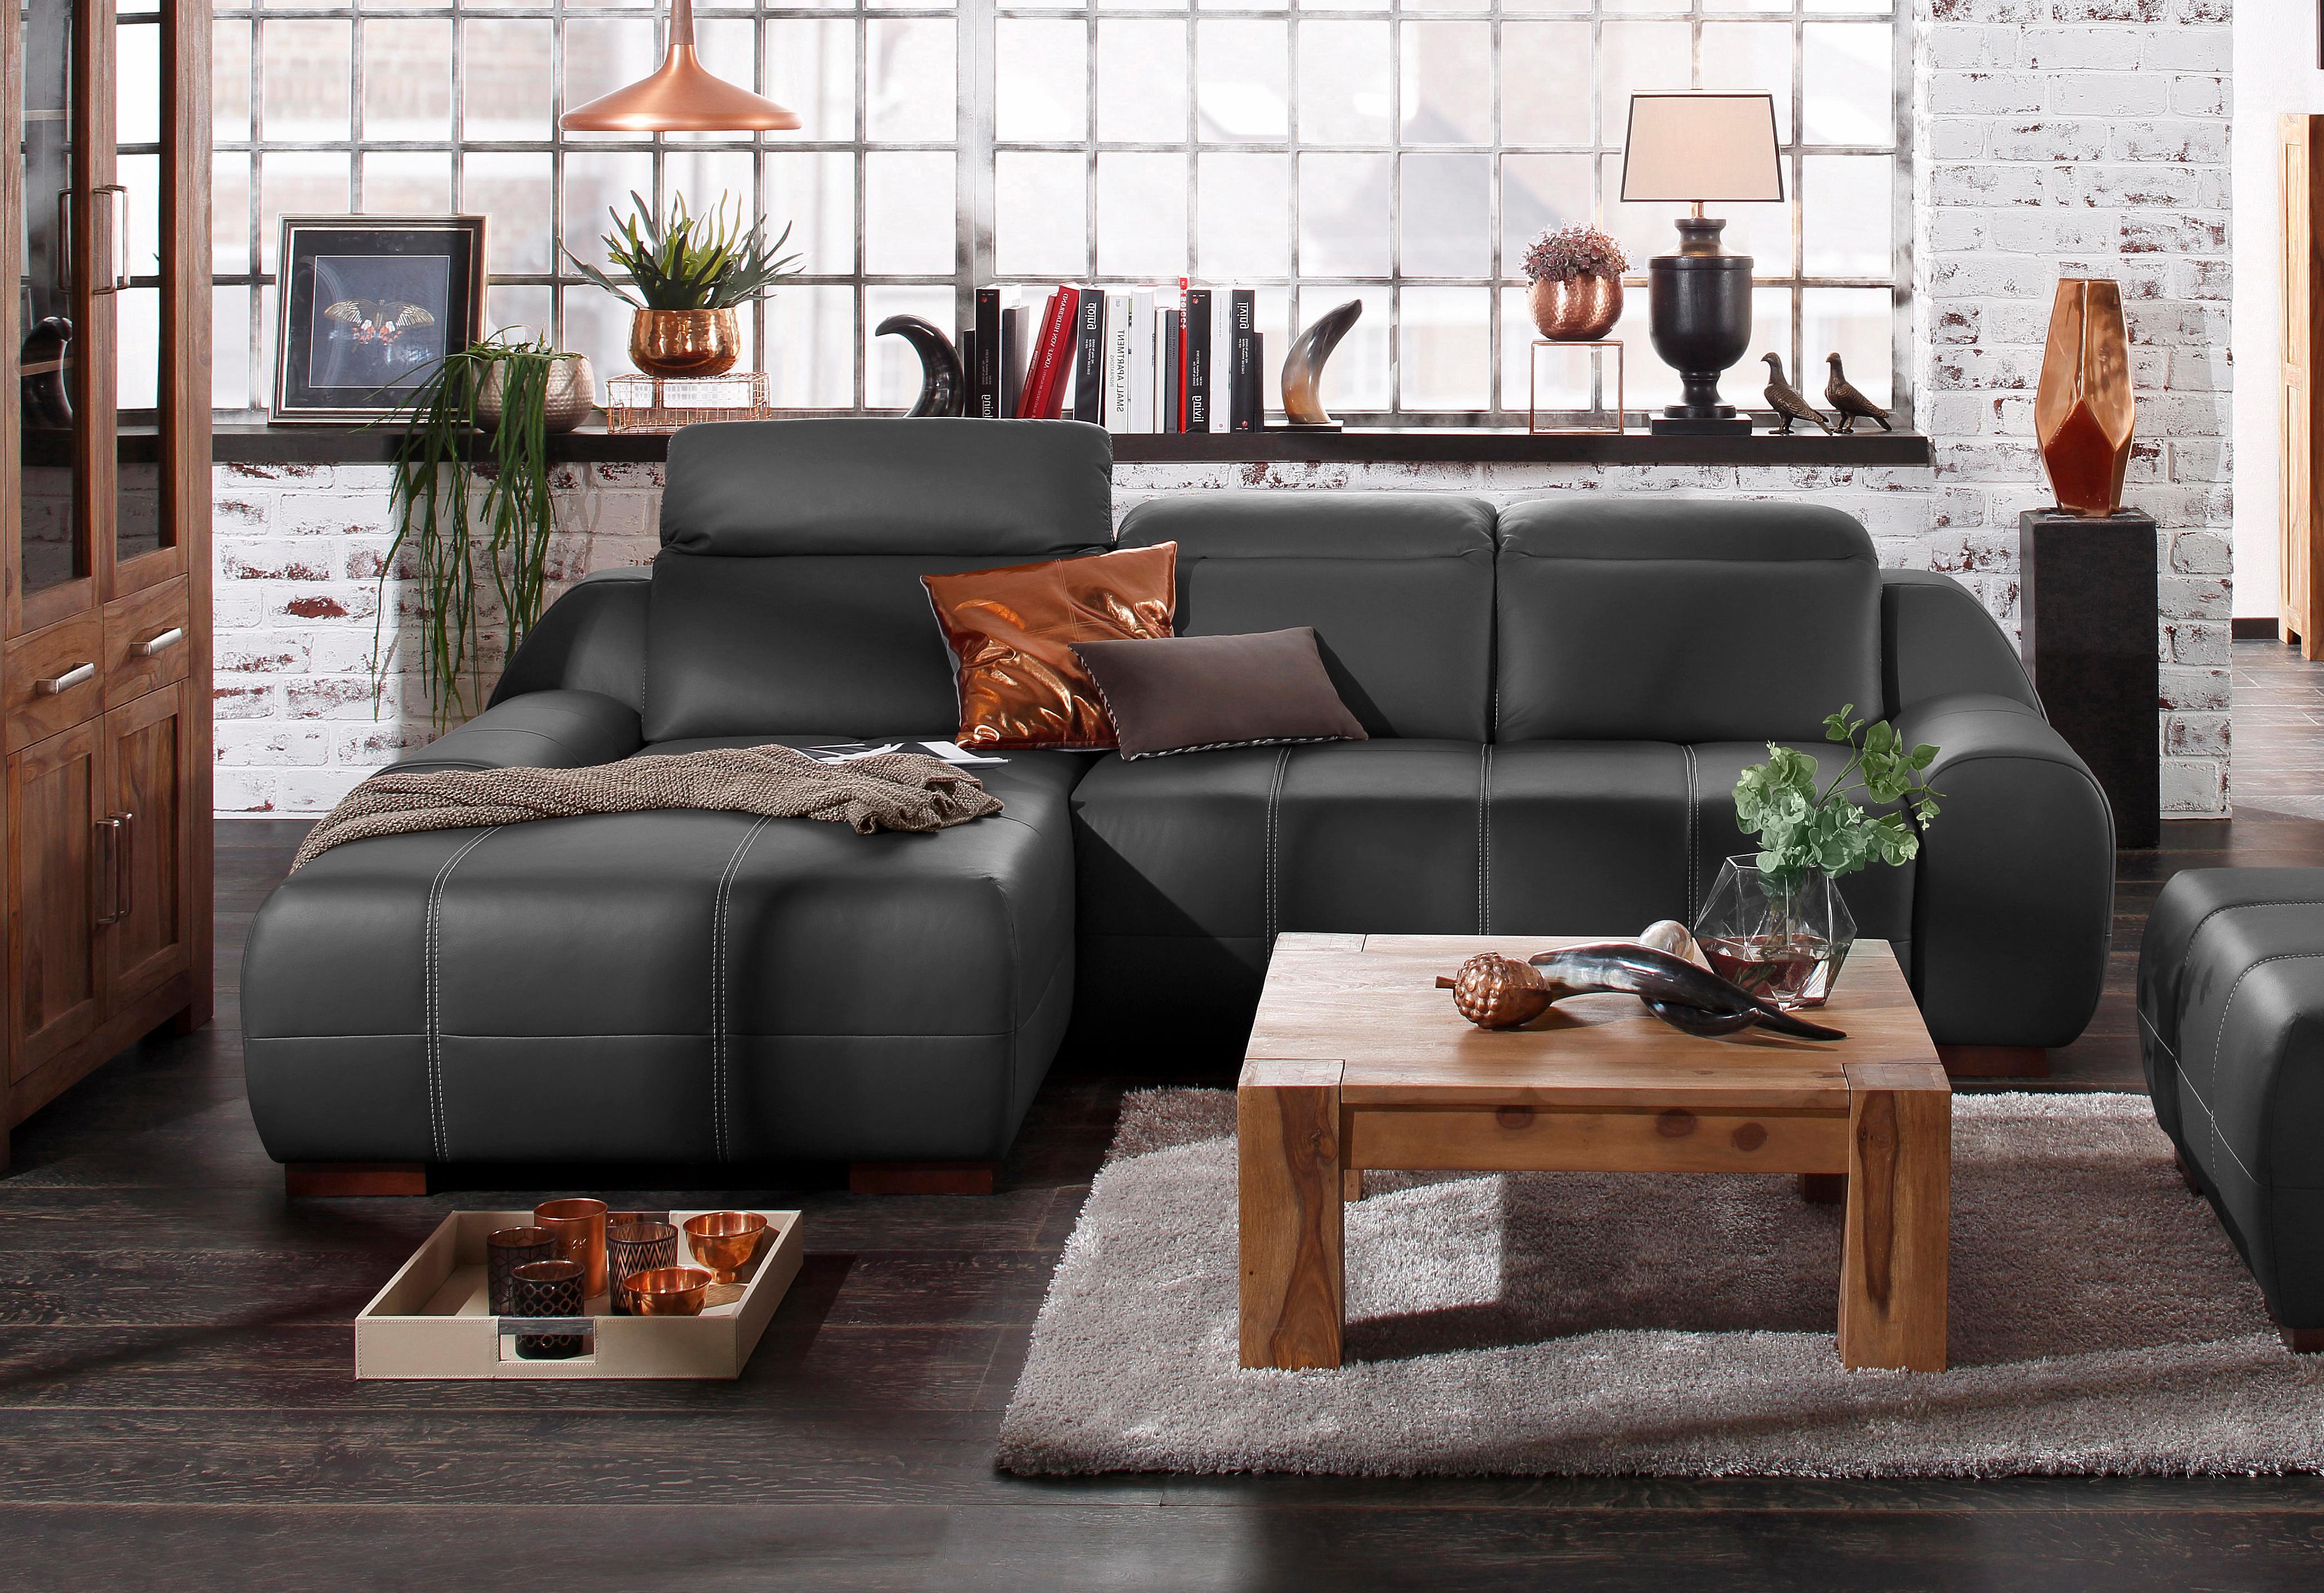 Premium collection by Home affaire Ecksofa Spirit